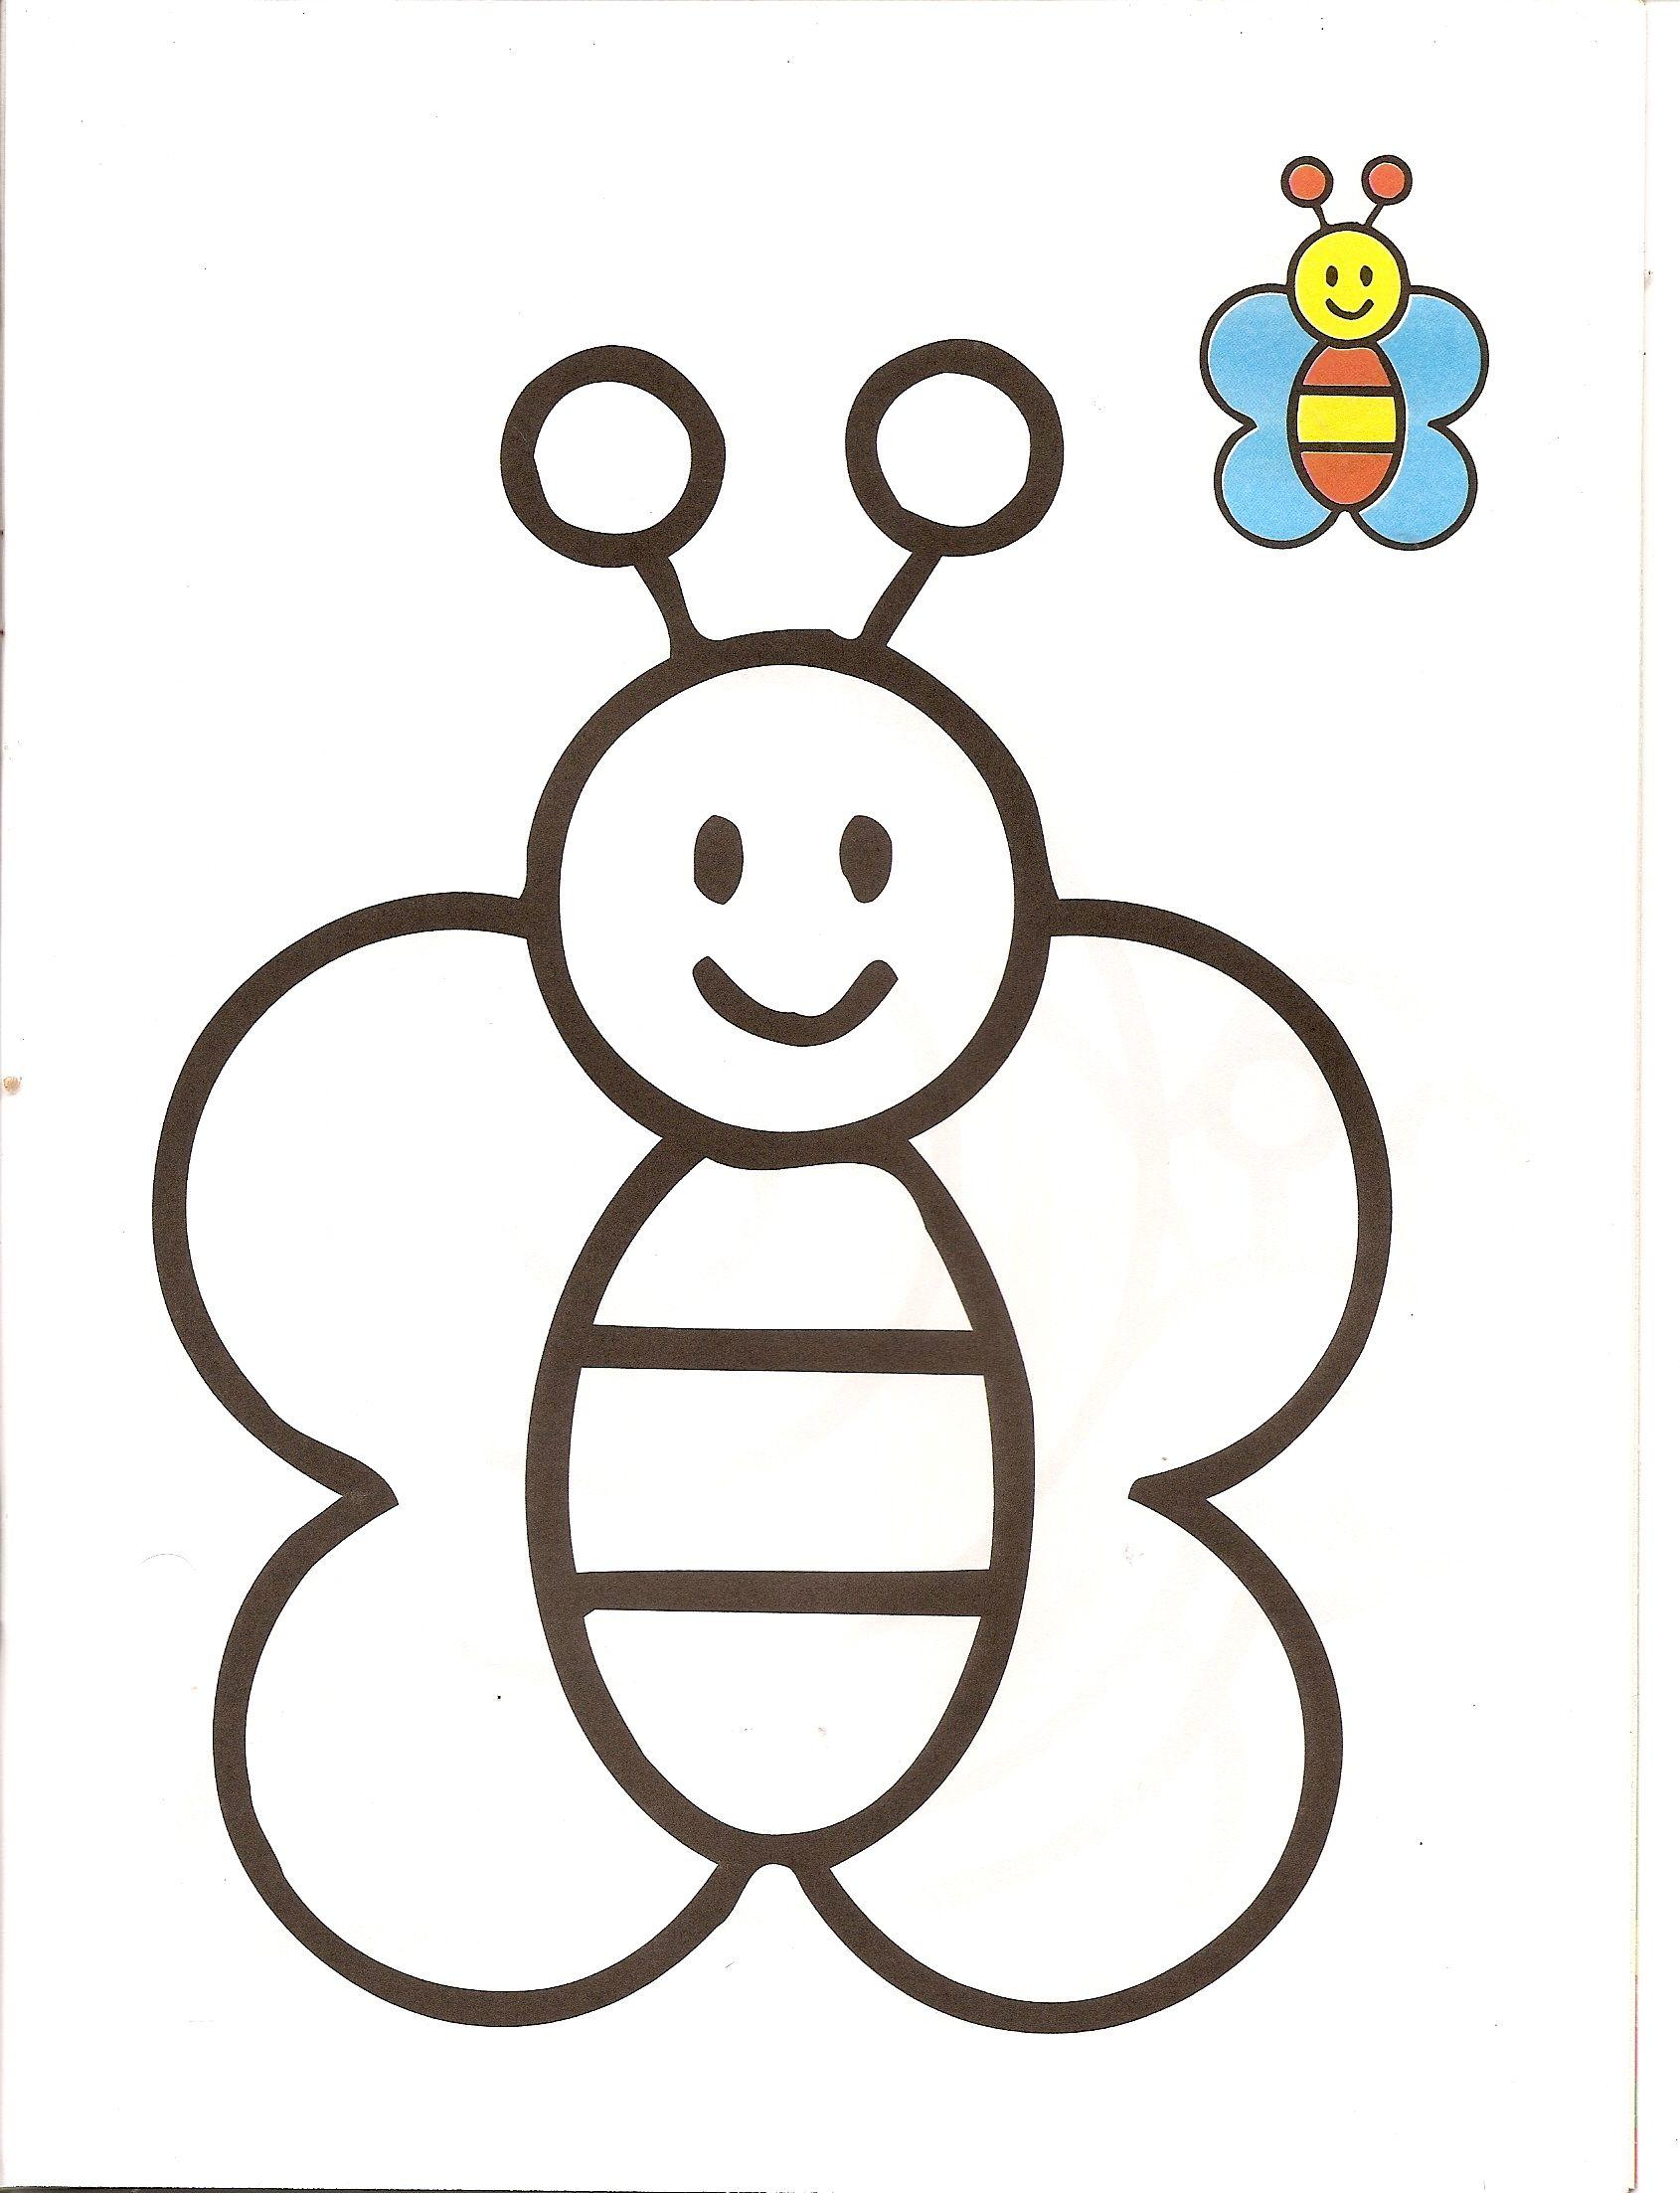 dibujos faciles para colorear - Buscar con Google | imagenes para ...